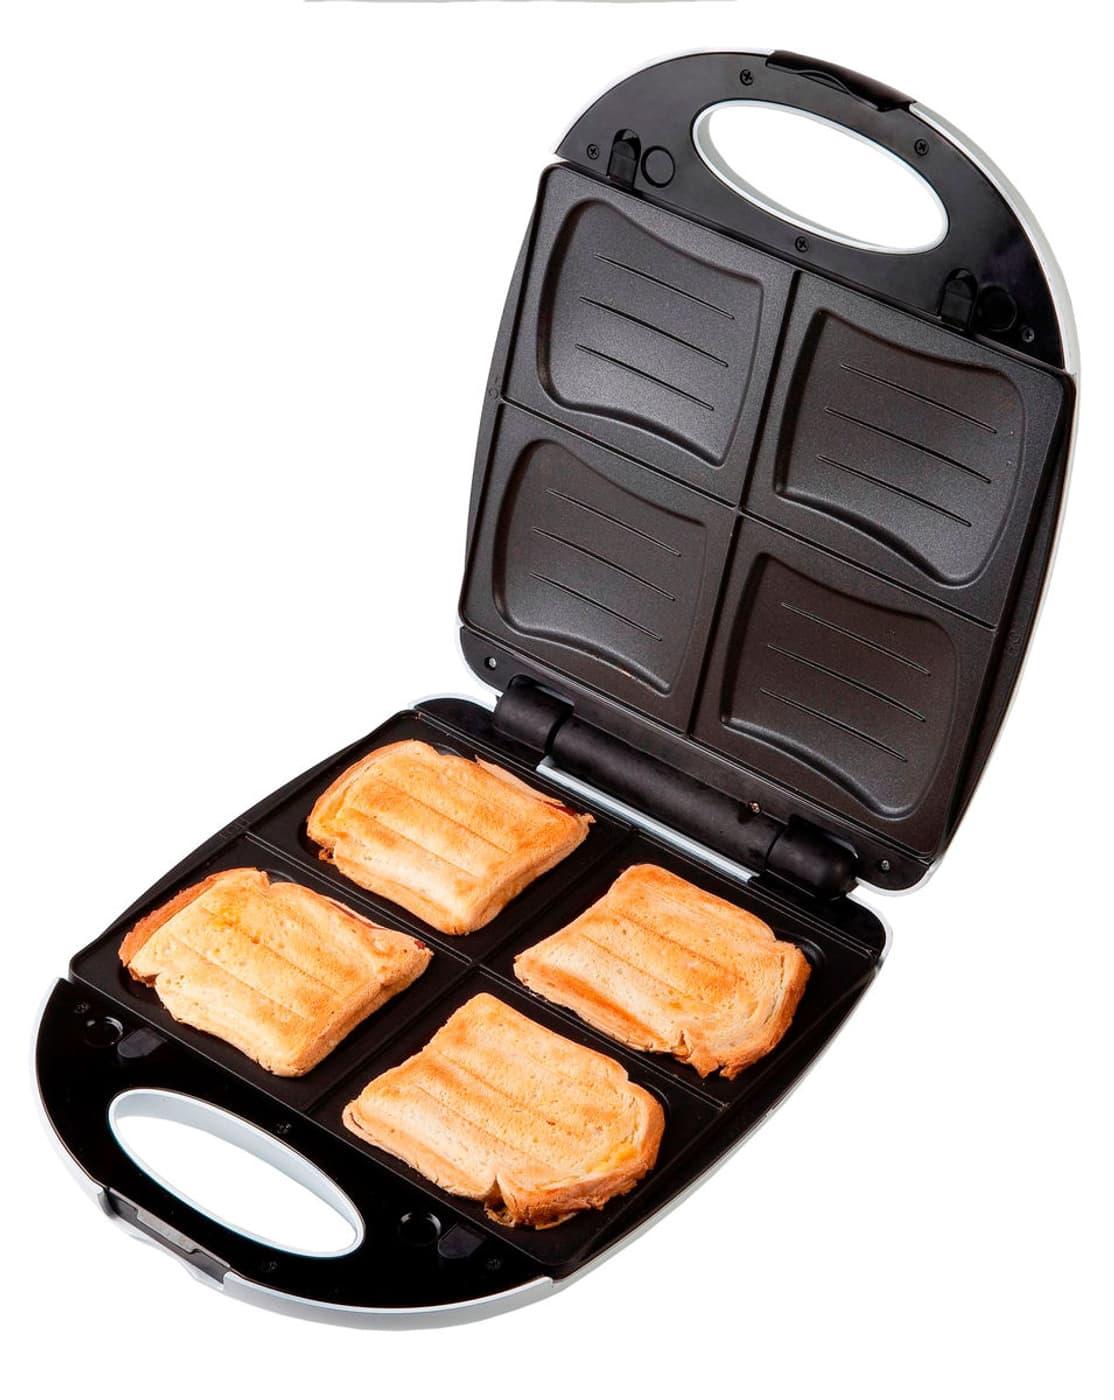 domo 4 sandwich maker do9046c inkl waffeleisen platten migros. Black Bedroom Furniture Sets. Home Design Ideas